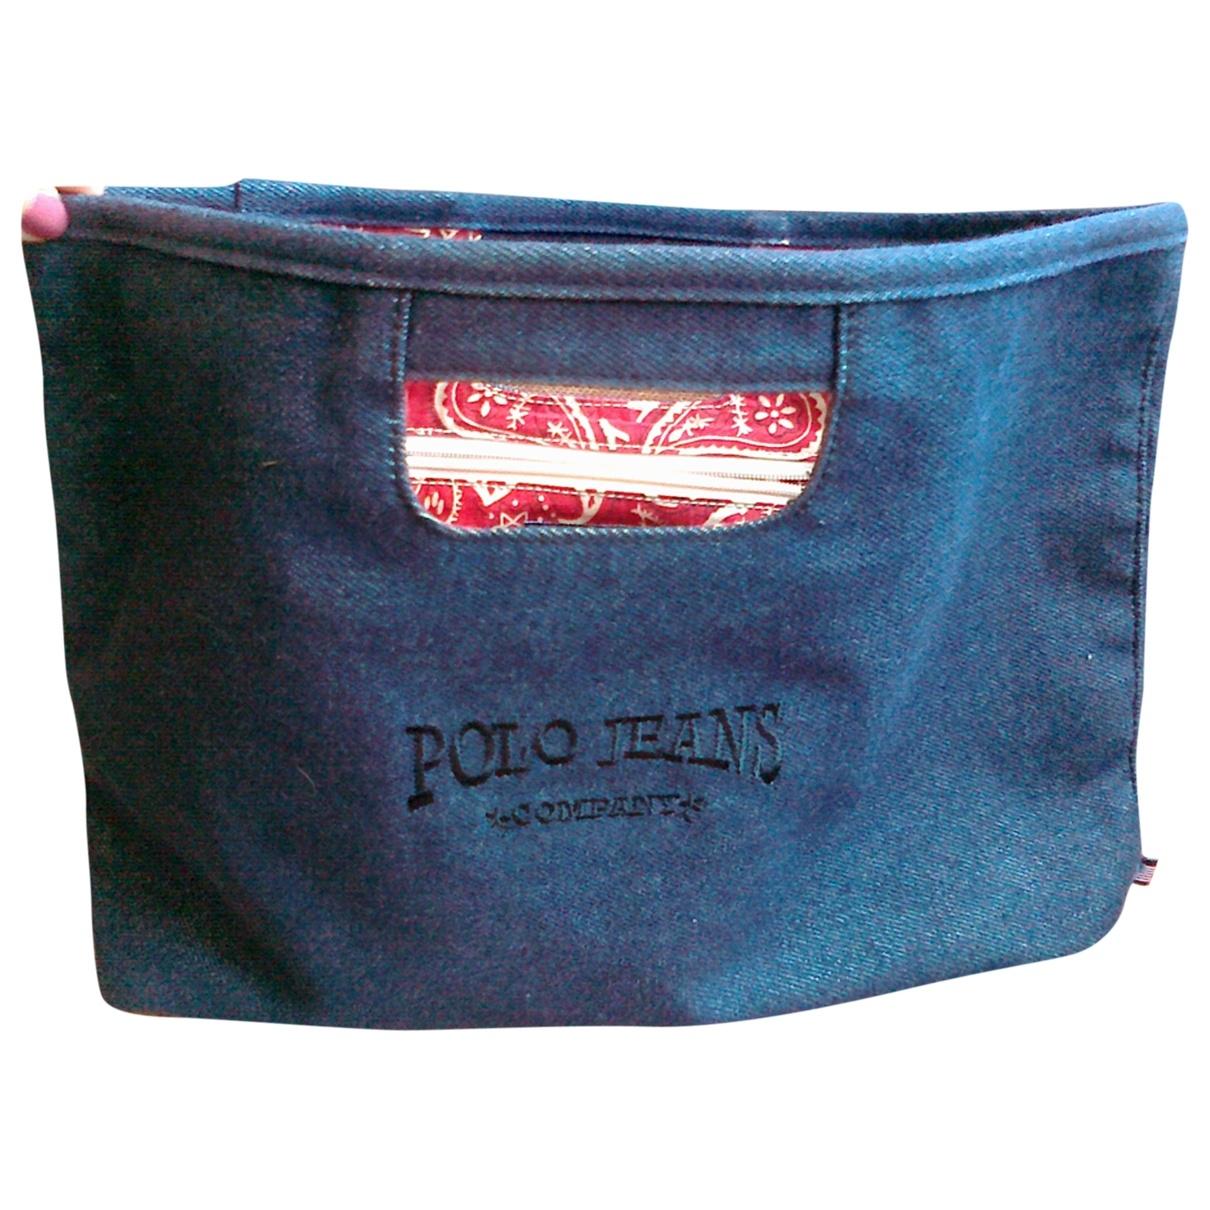 Polo Ralph Lauren \N Handtasche in  Blau Denim - Jeans